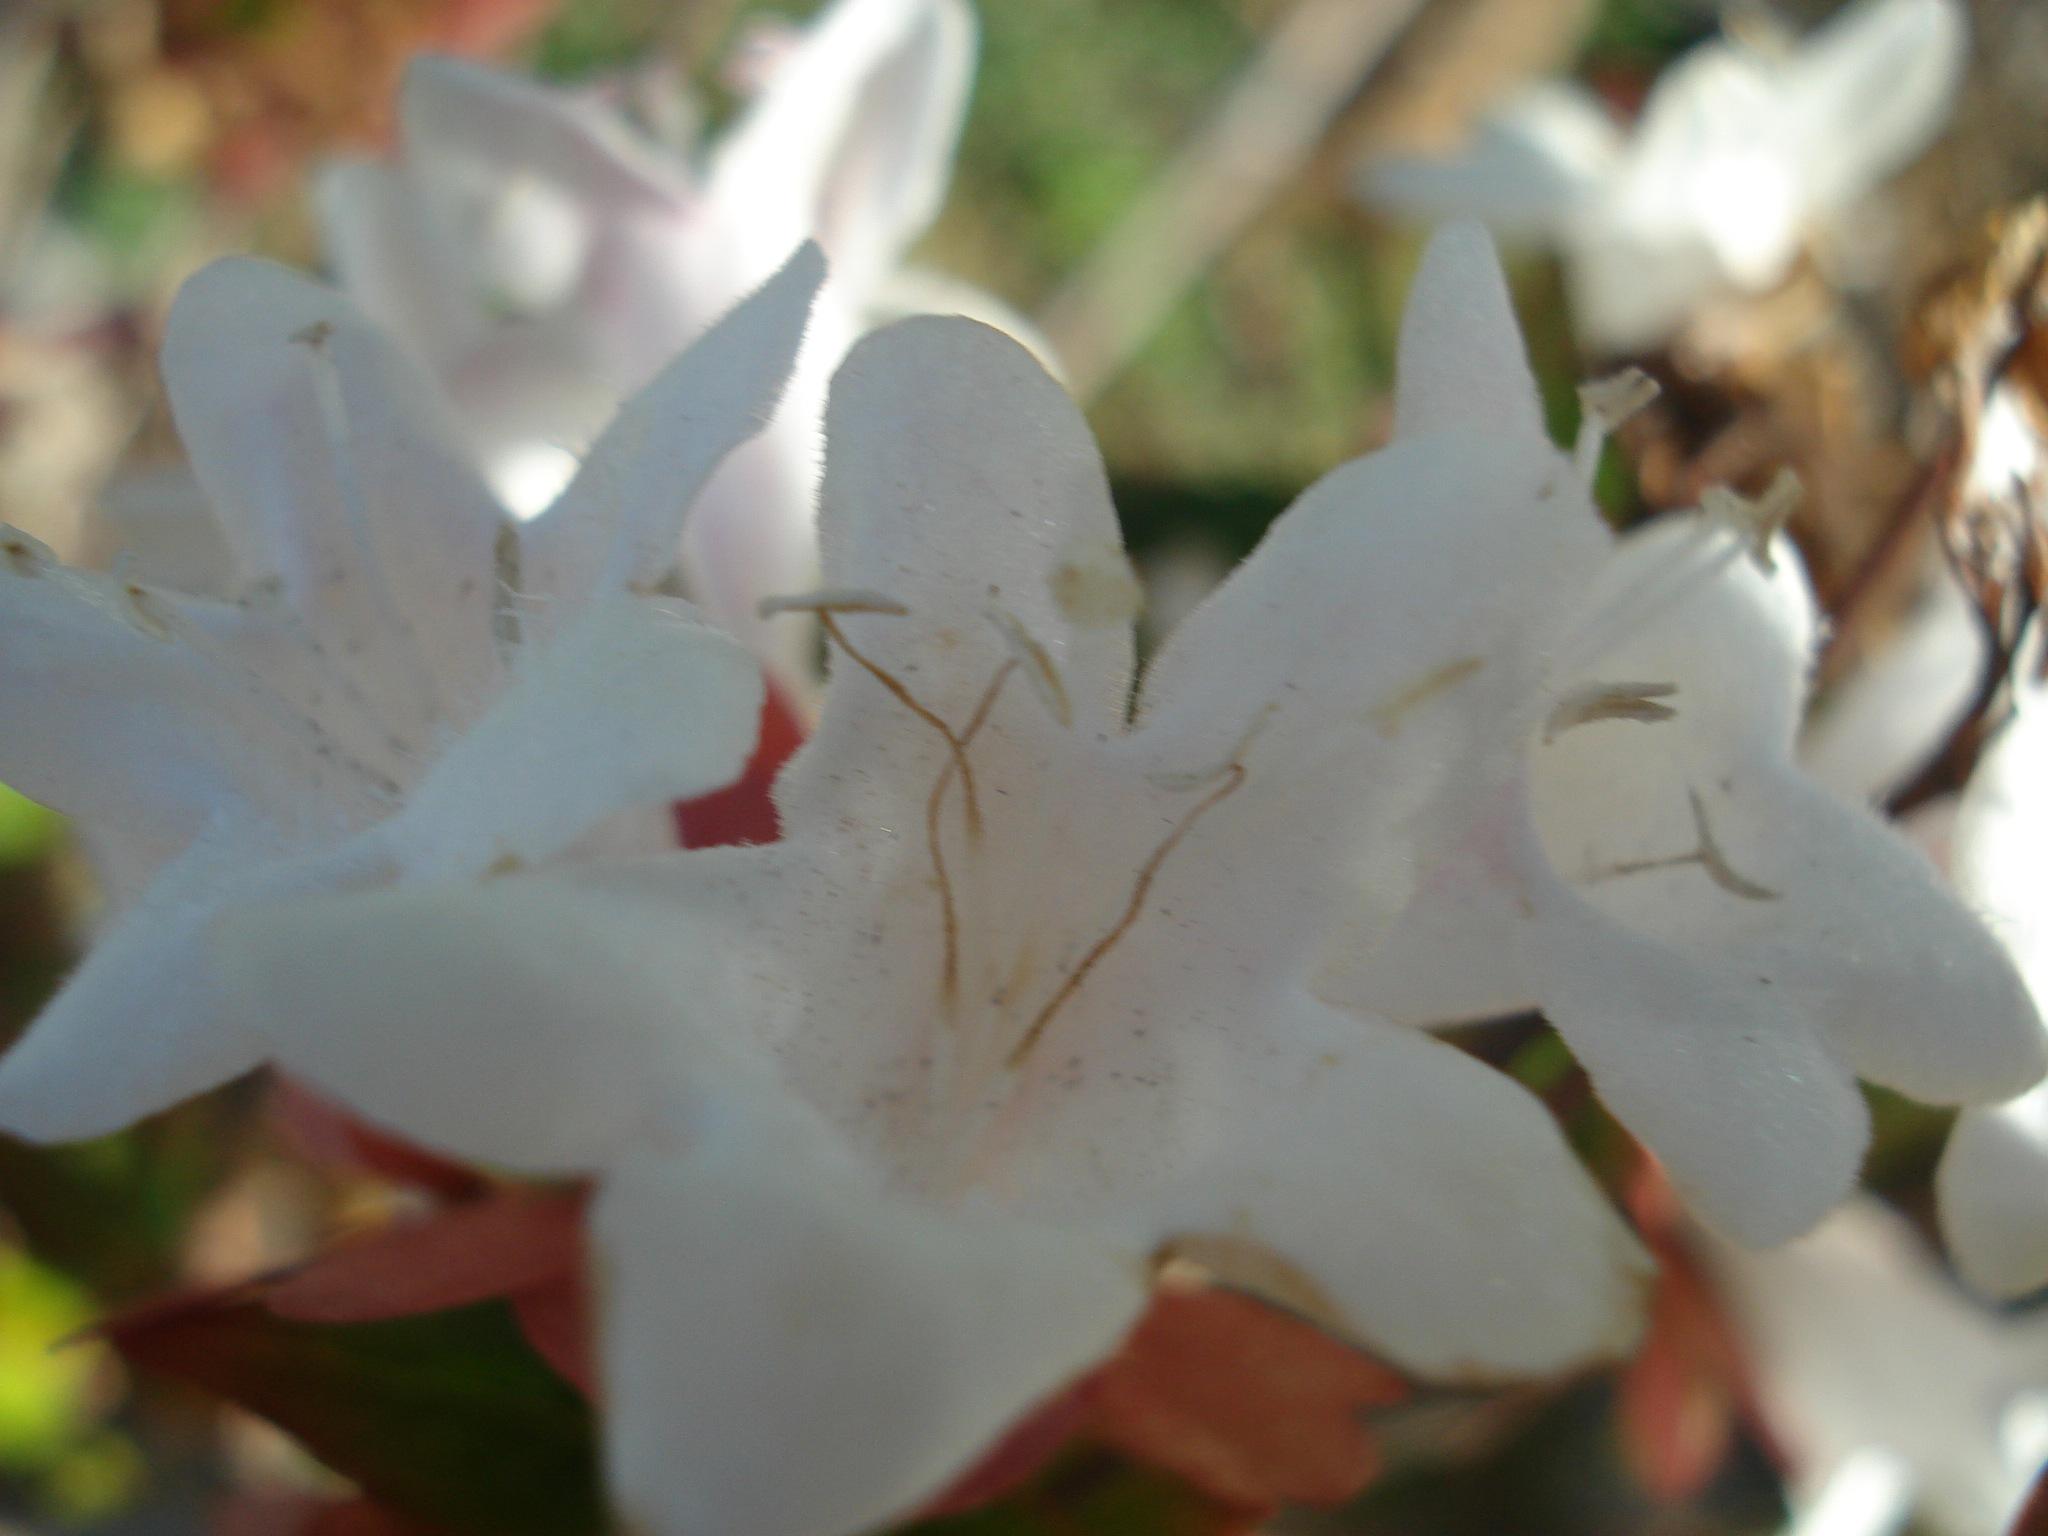 3 - 17/3/18 .. 72-73 .. WATERMARKED FLOWERS .. by GÜVEN YENERSOY